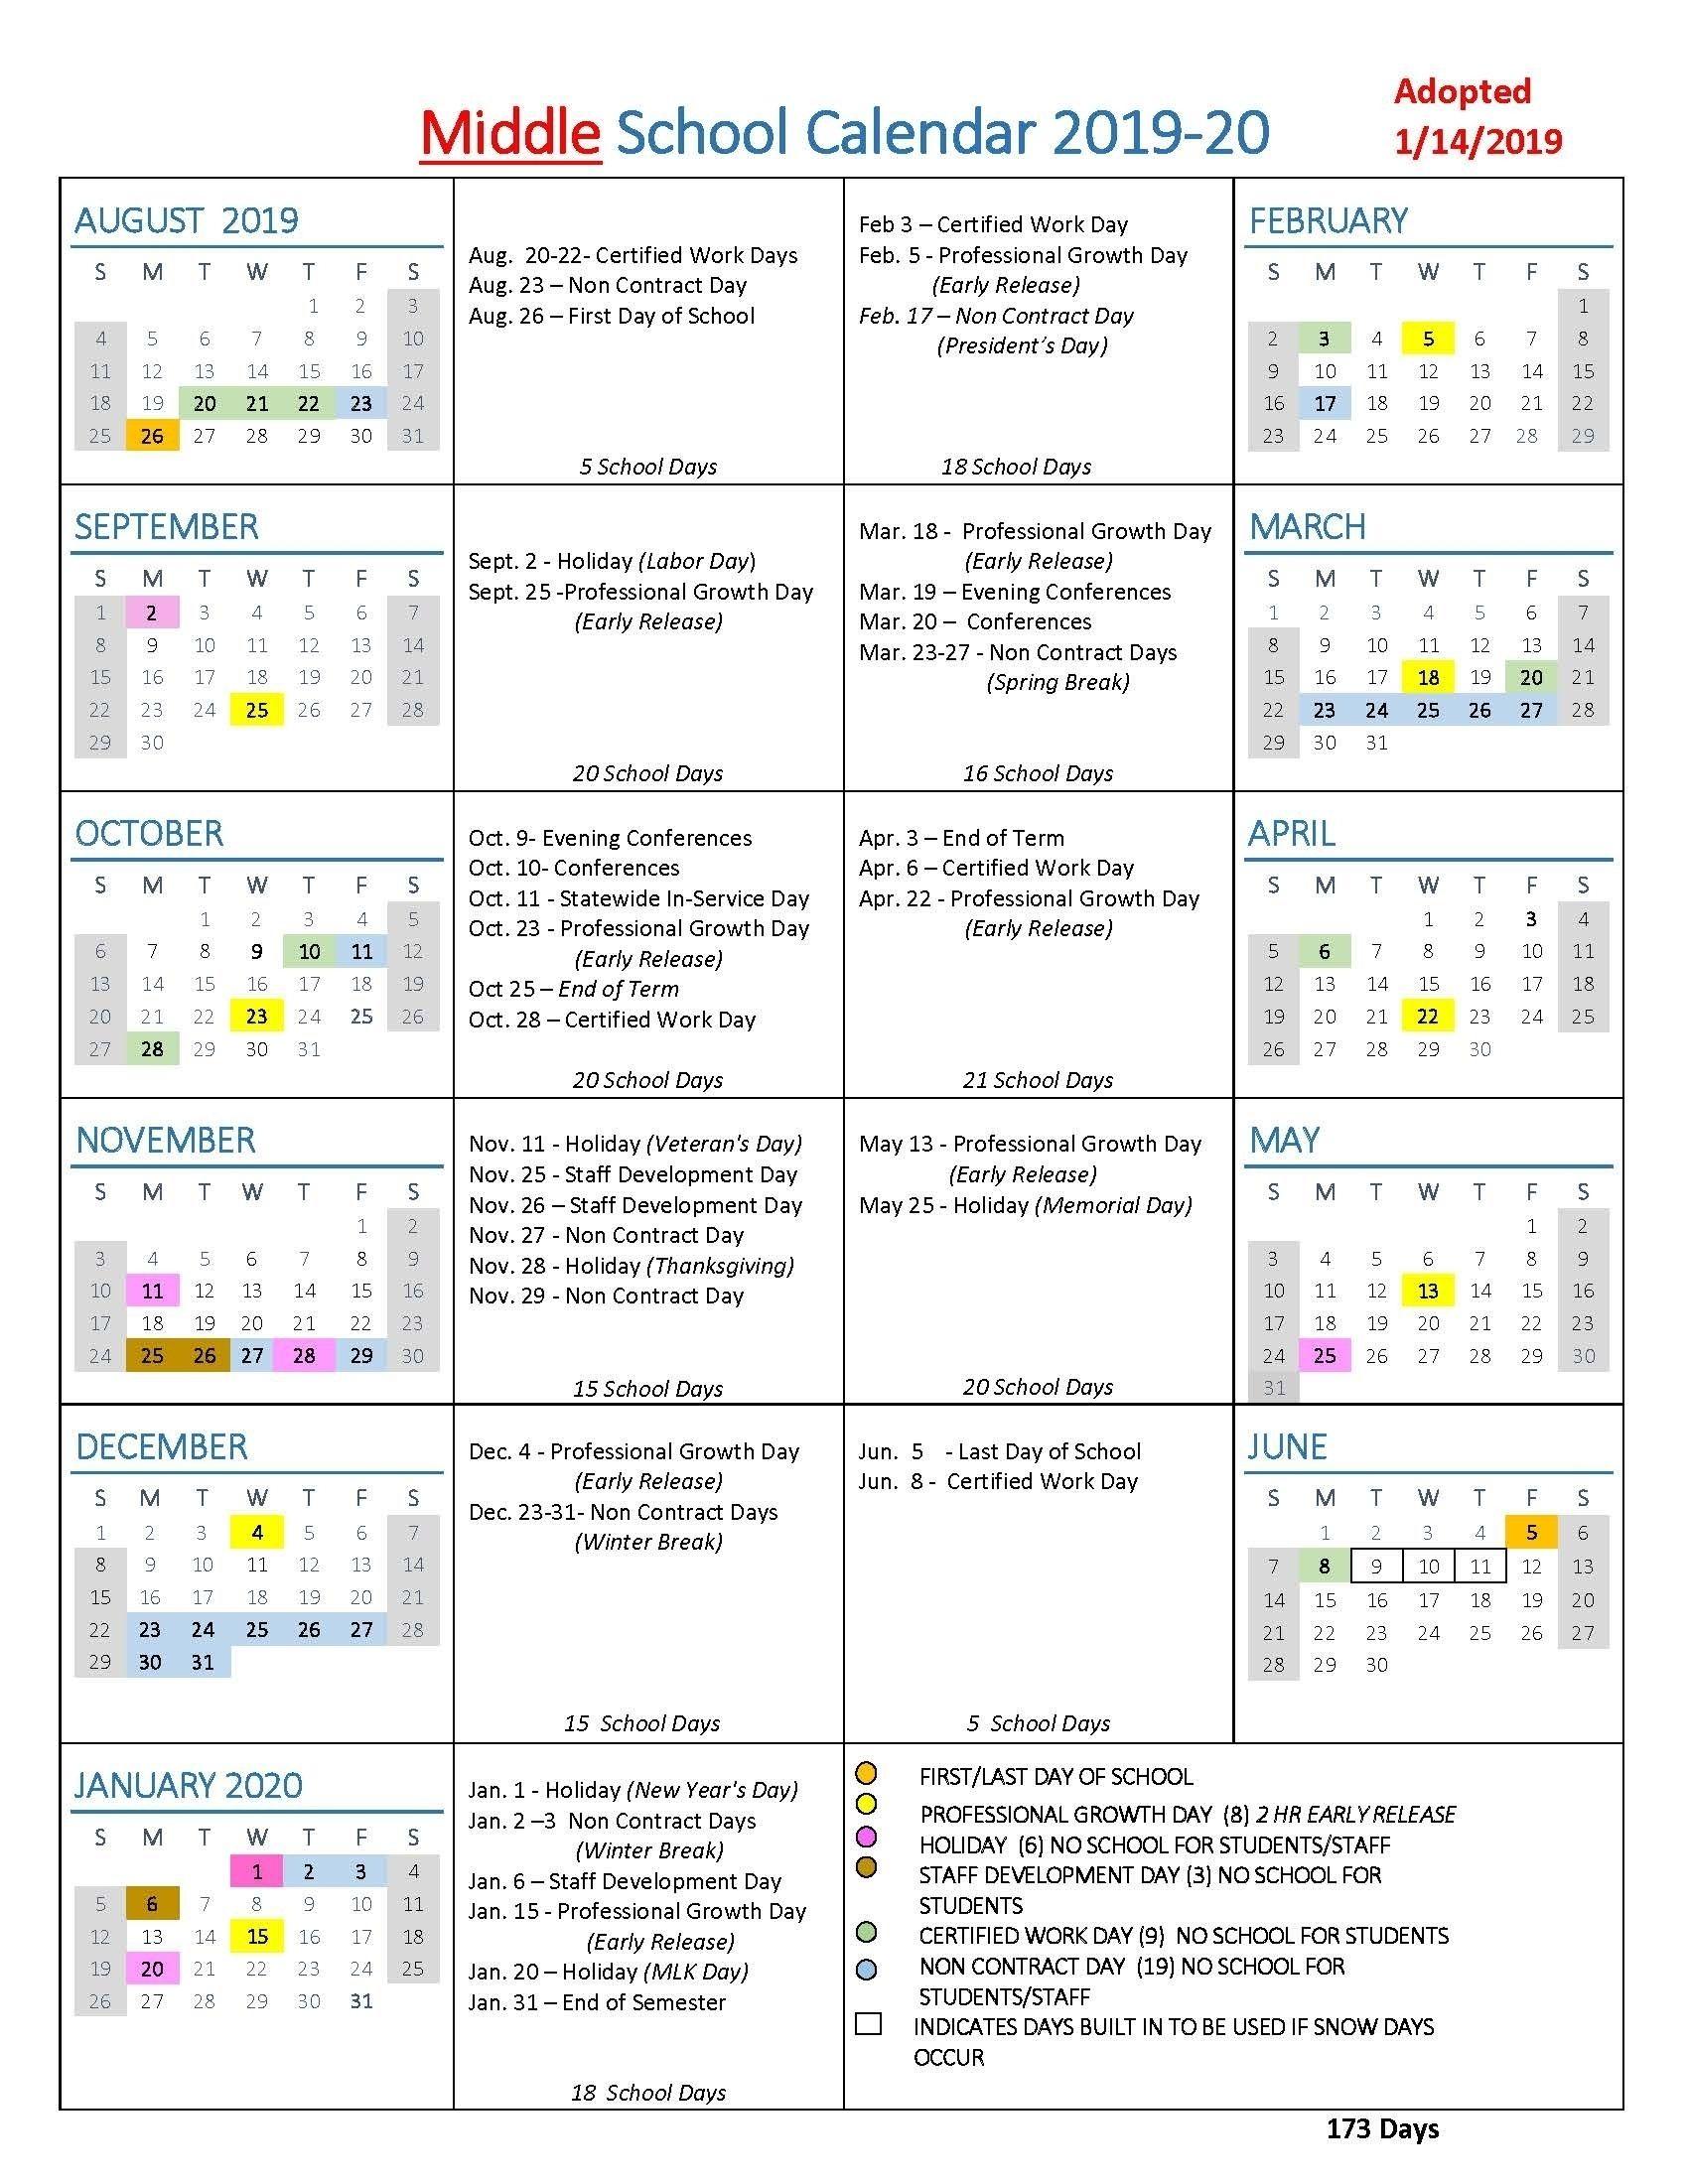 Special Days For 2020 Calender In 2020 | School Calendar